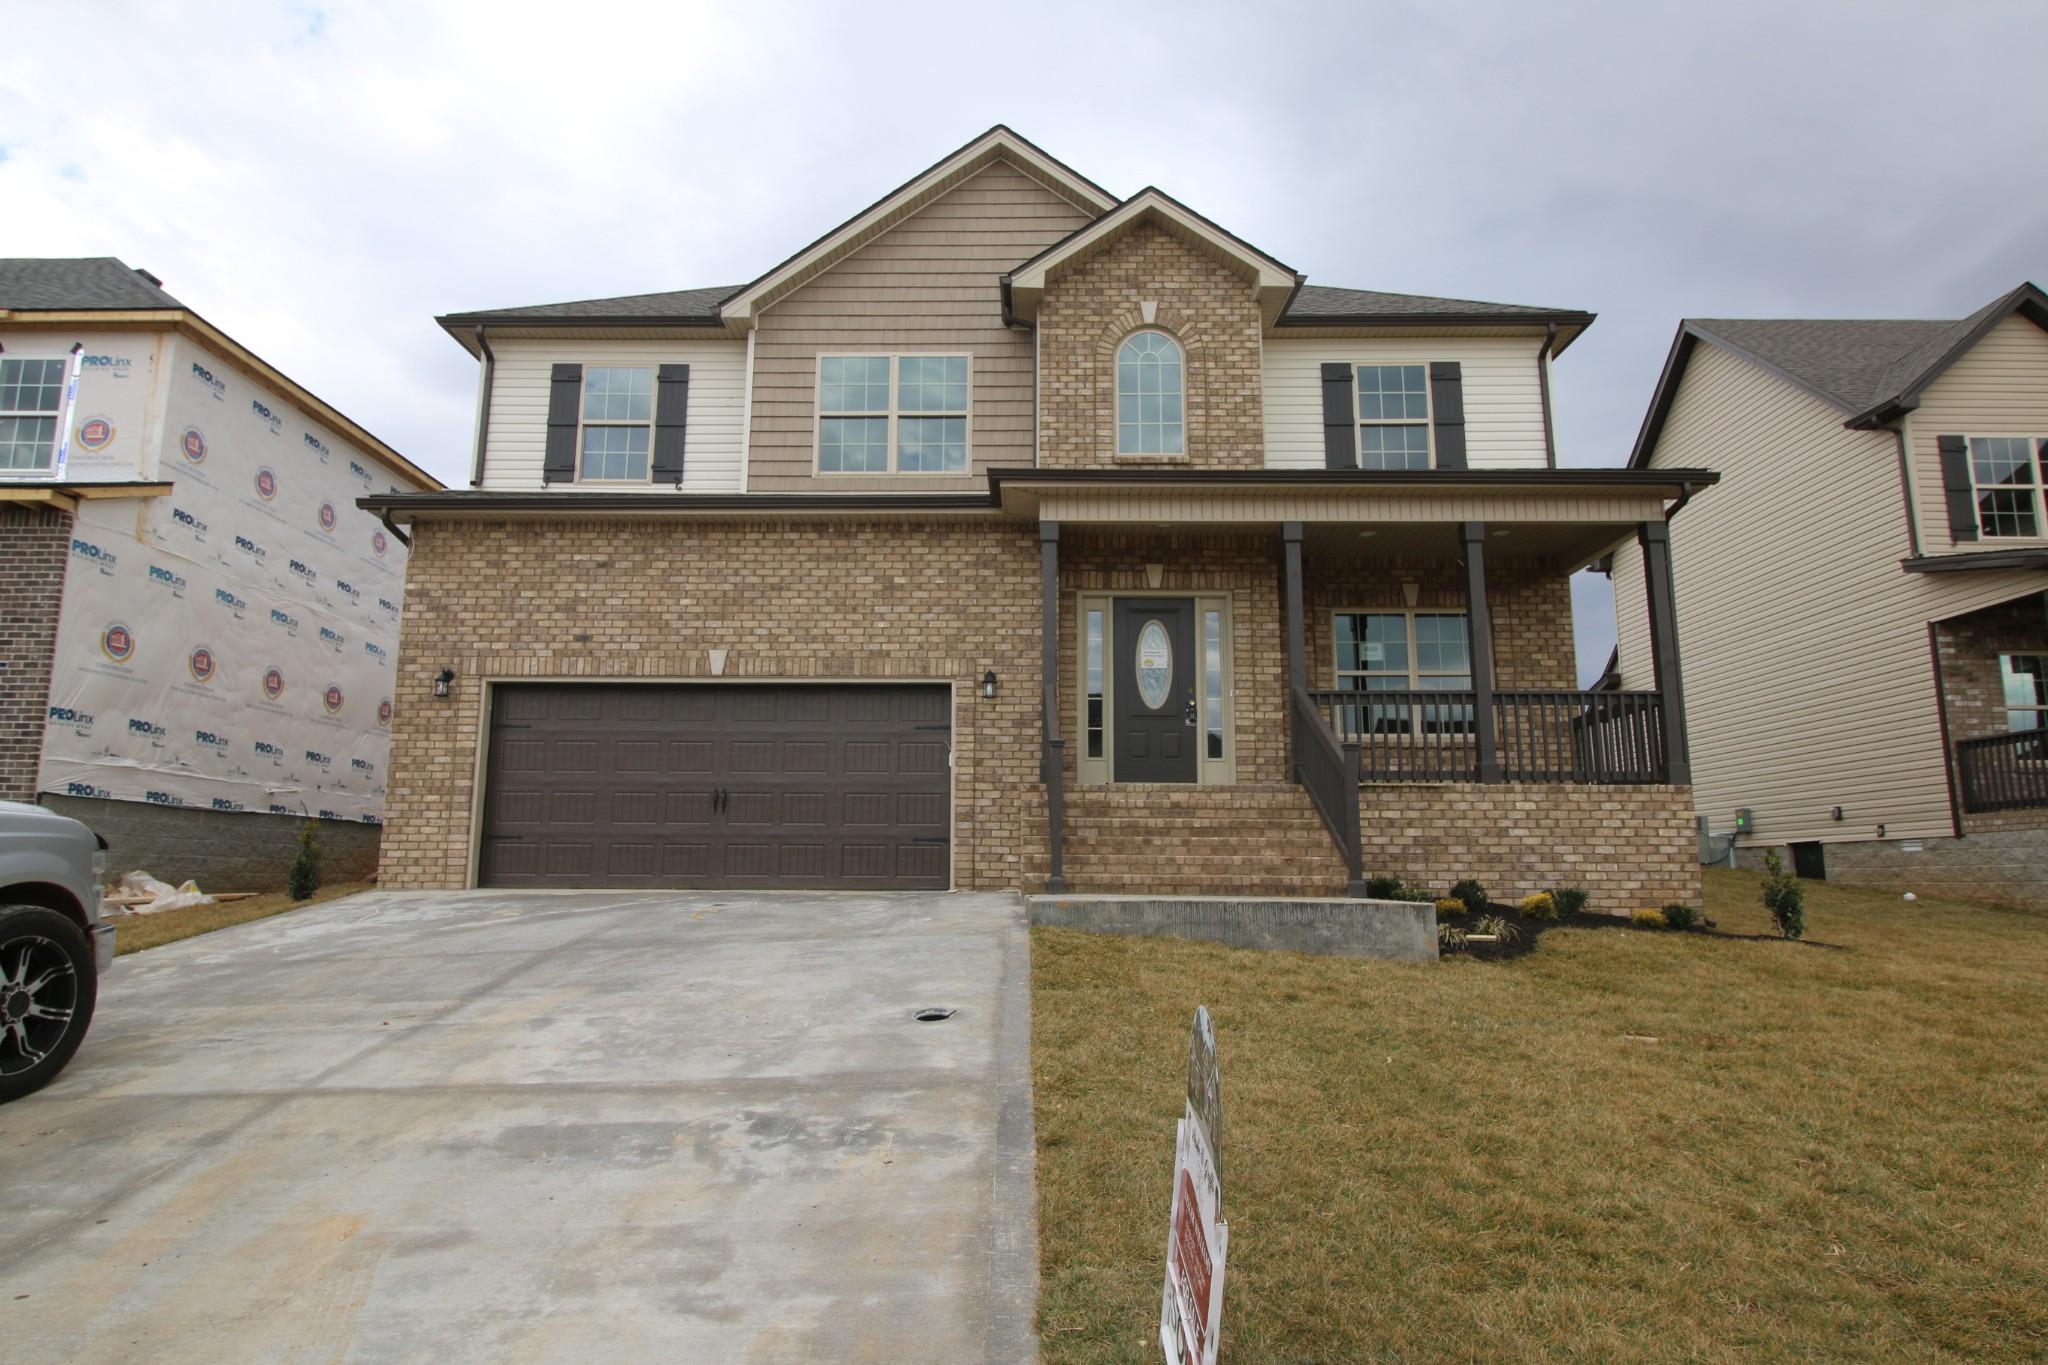 469 Autumn Creek Property Photo - Clarksville, TN real estate listing